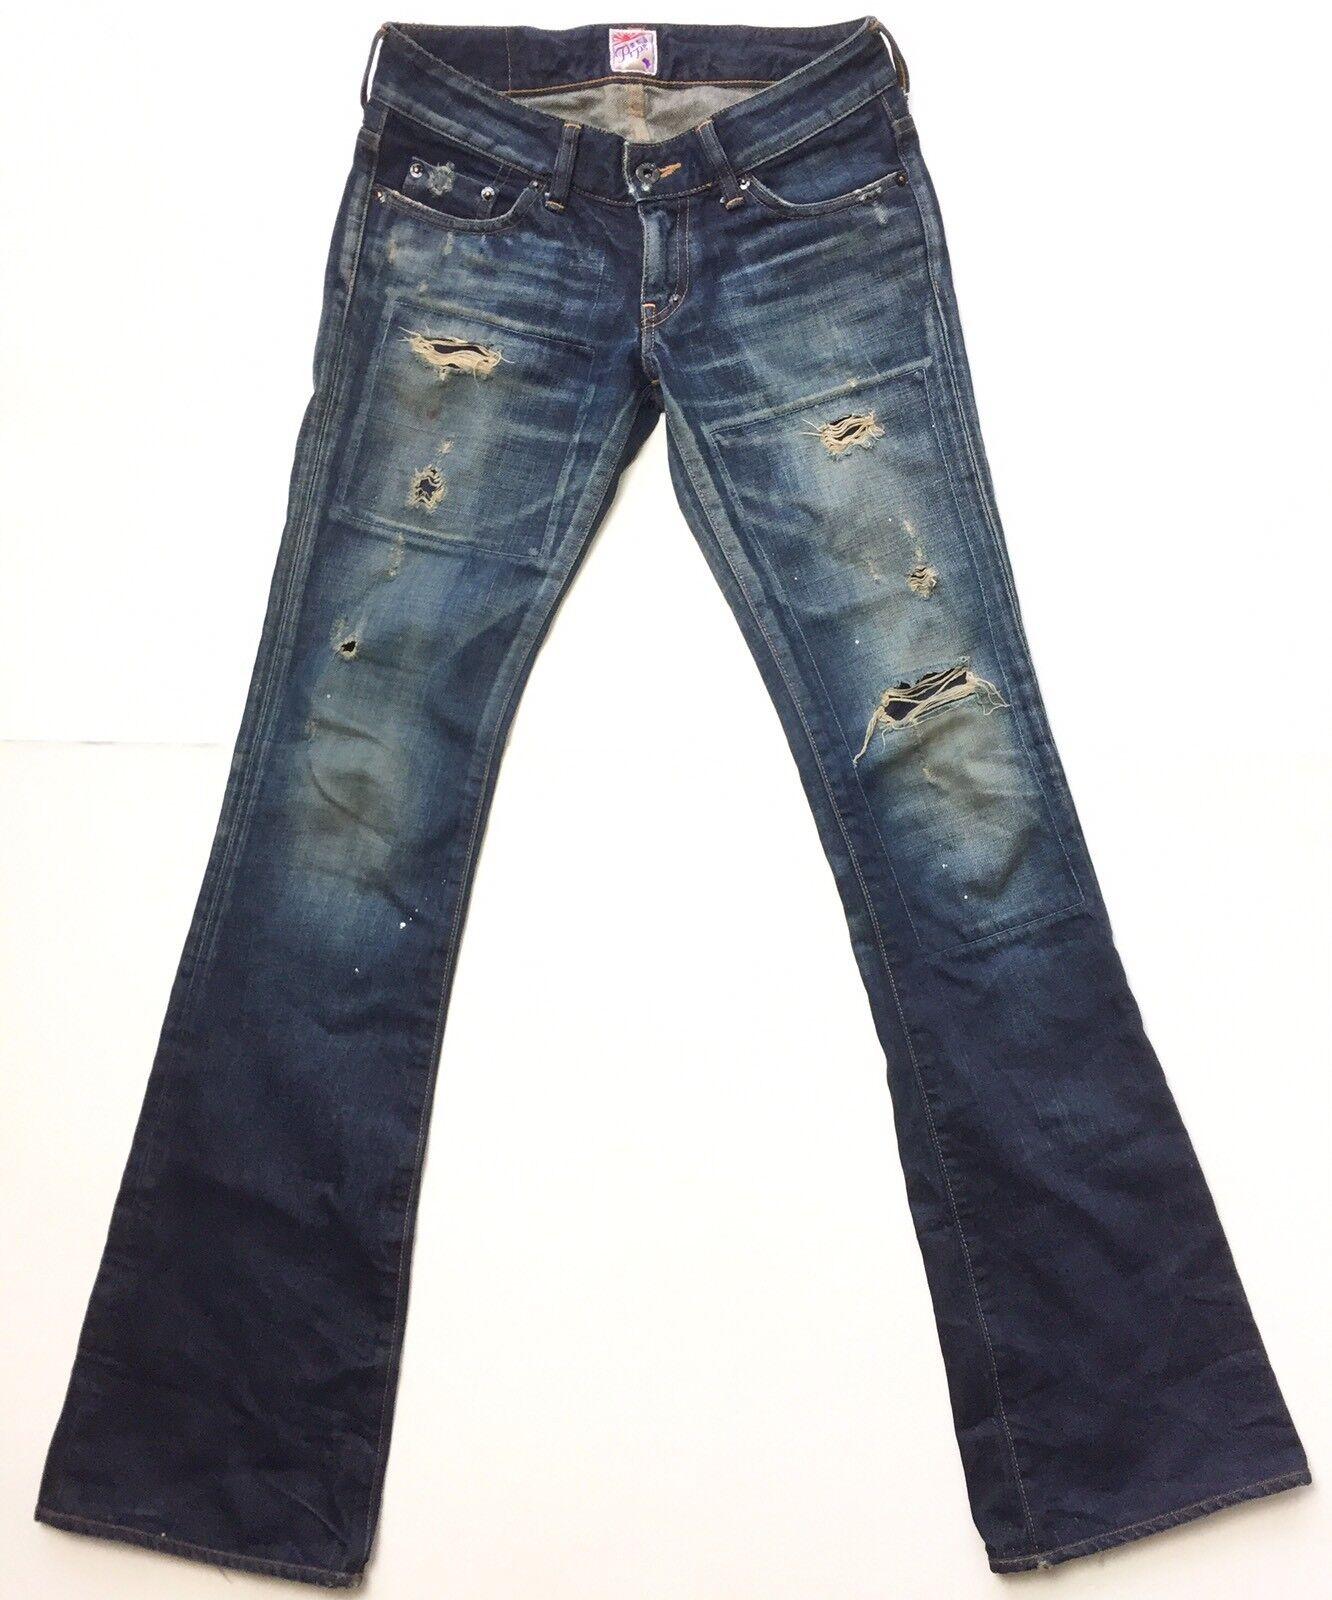 Prps Japan Women's bluee Daytona Distressed Destroyed Bootcut Jeans Size 25